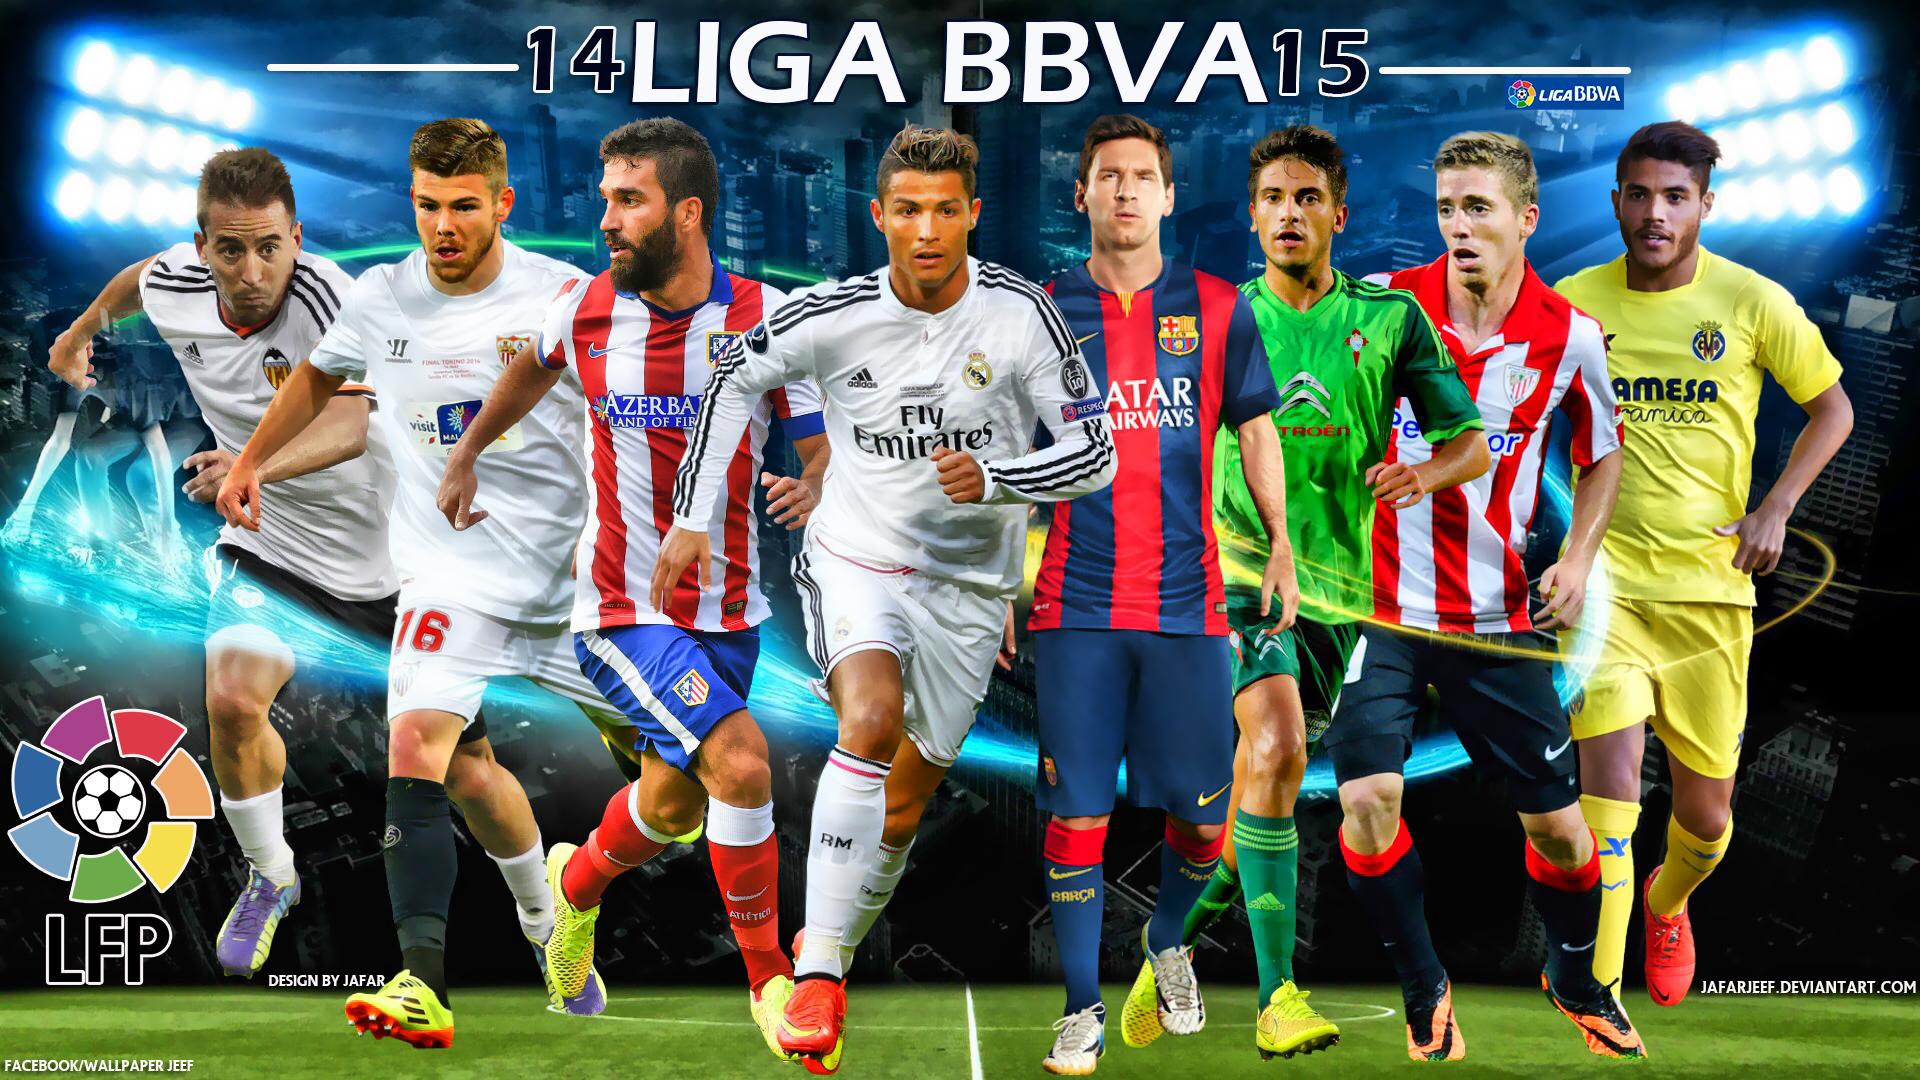 Liga BBVA 2014 2015 Football Stars Wallpaper PlusFutboles 1920x1080